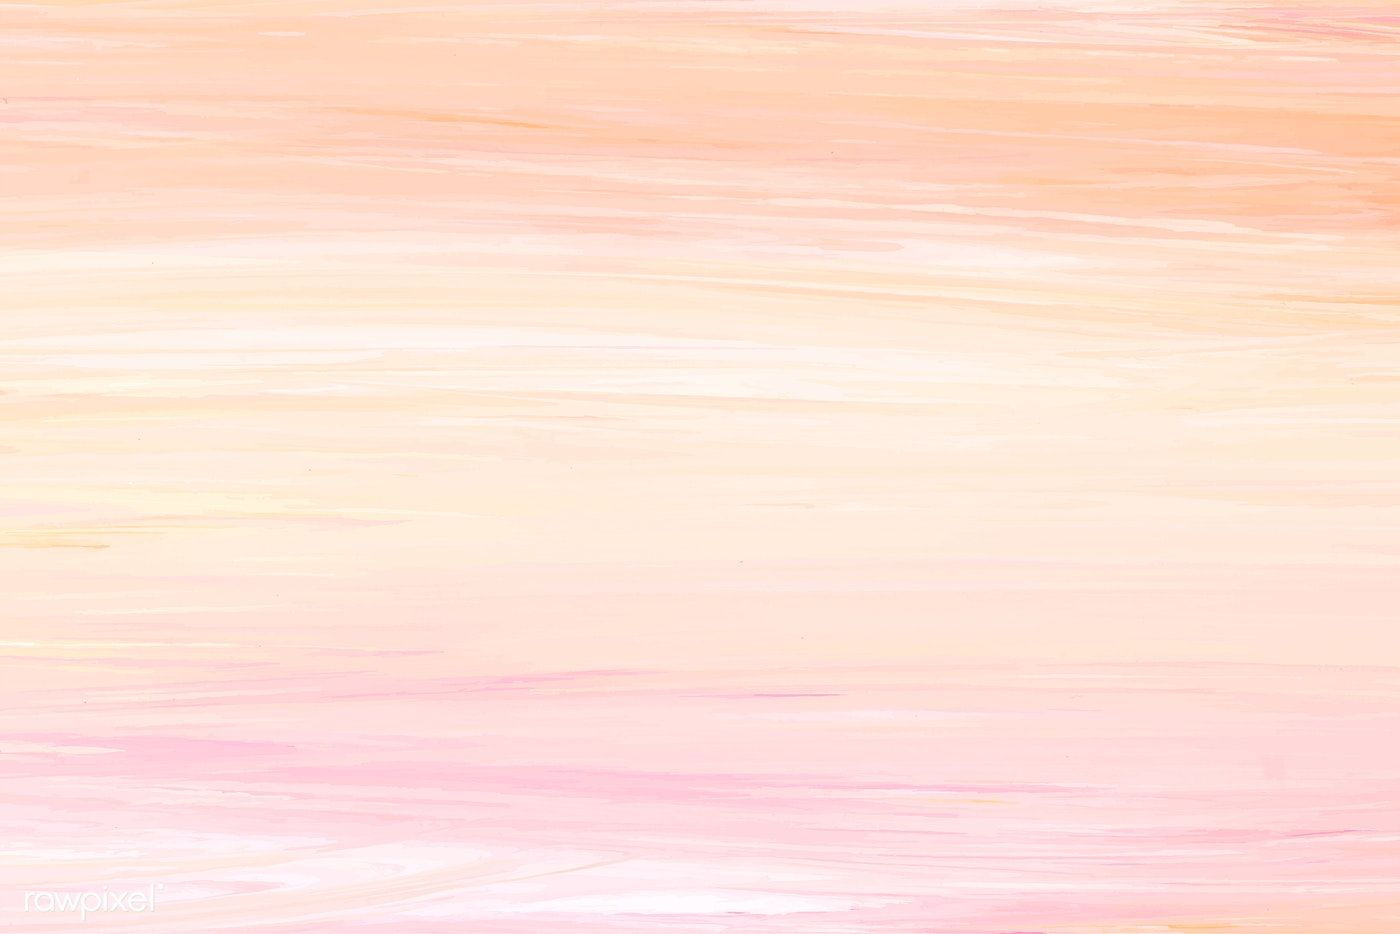 Pastel Orange Paintbrush Stroke Textured Background Vector Free Image By Rawpixel Com Watercolour Texture Background Textured Background Pastel Background